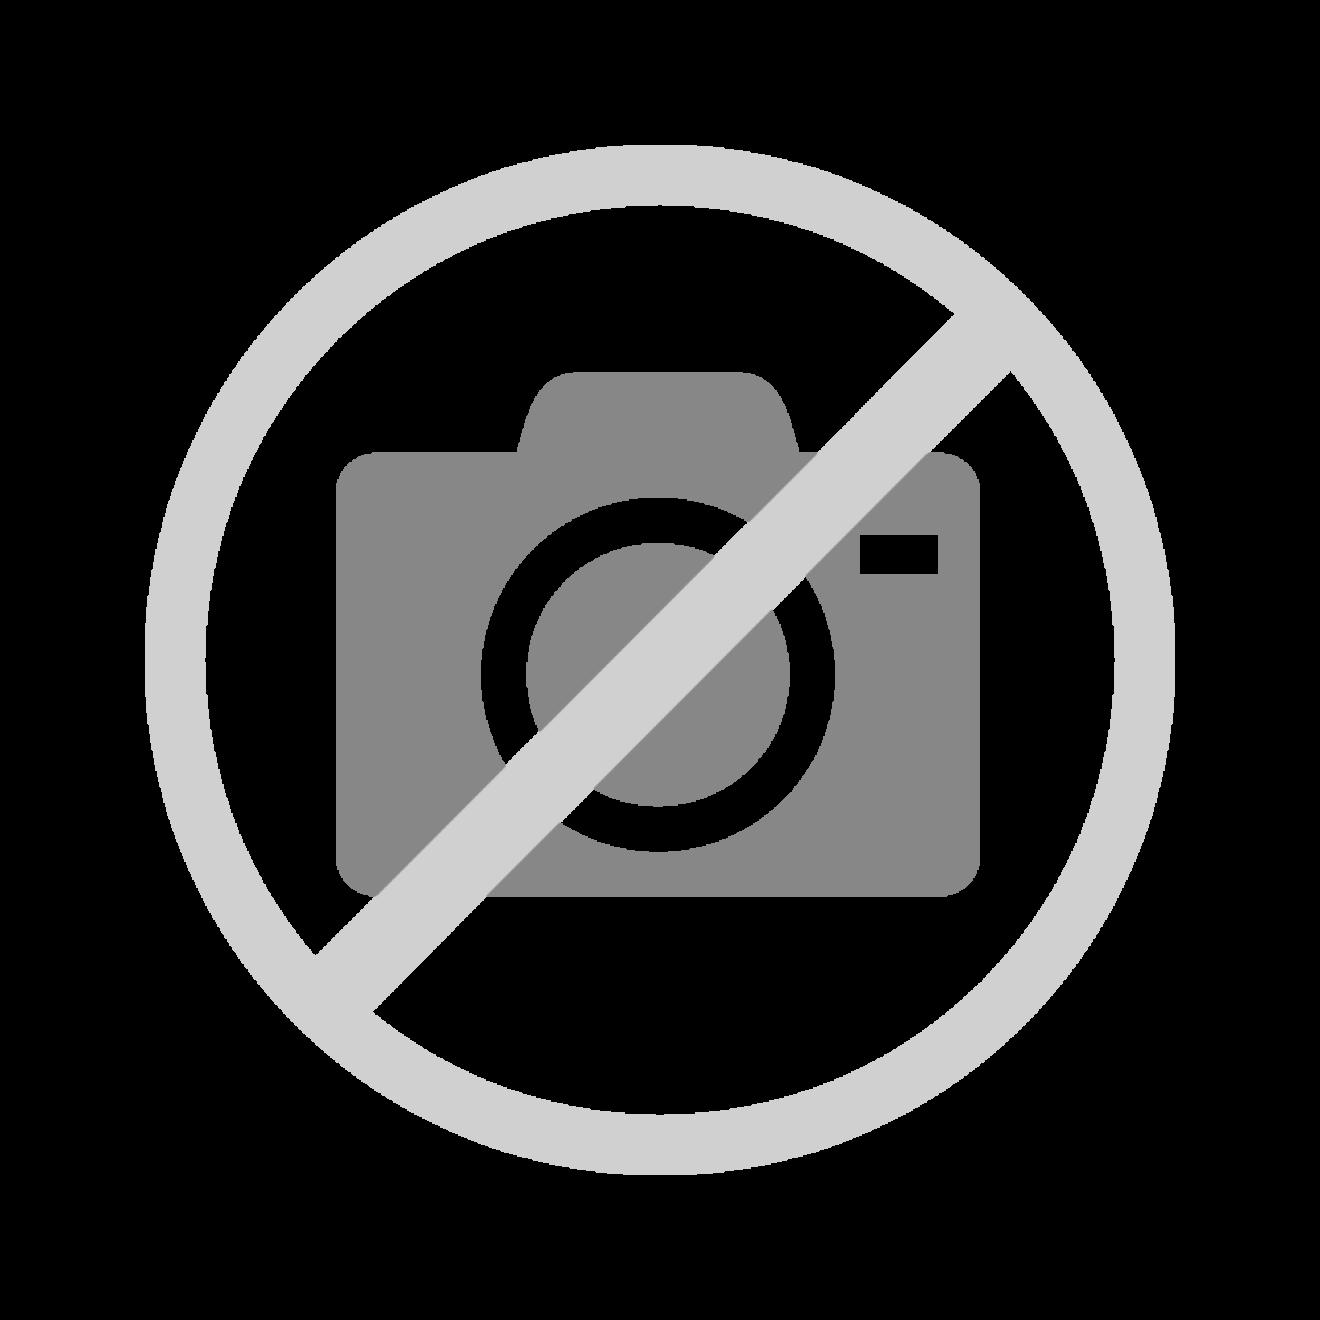 tafel schwarz pferdemotiv kreidetafel stalltafel. Black Bedroom Furniture Sets. Home Design Ideas